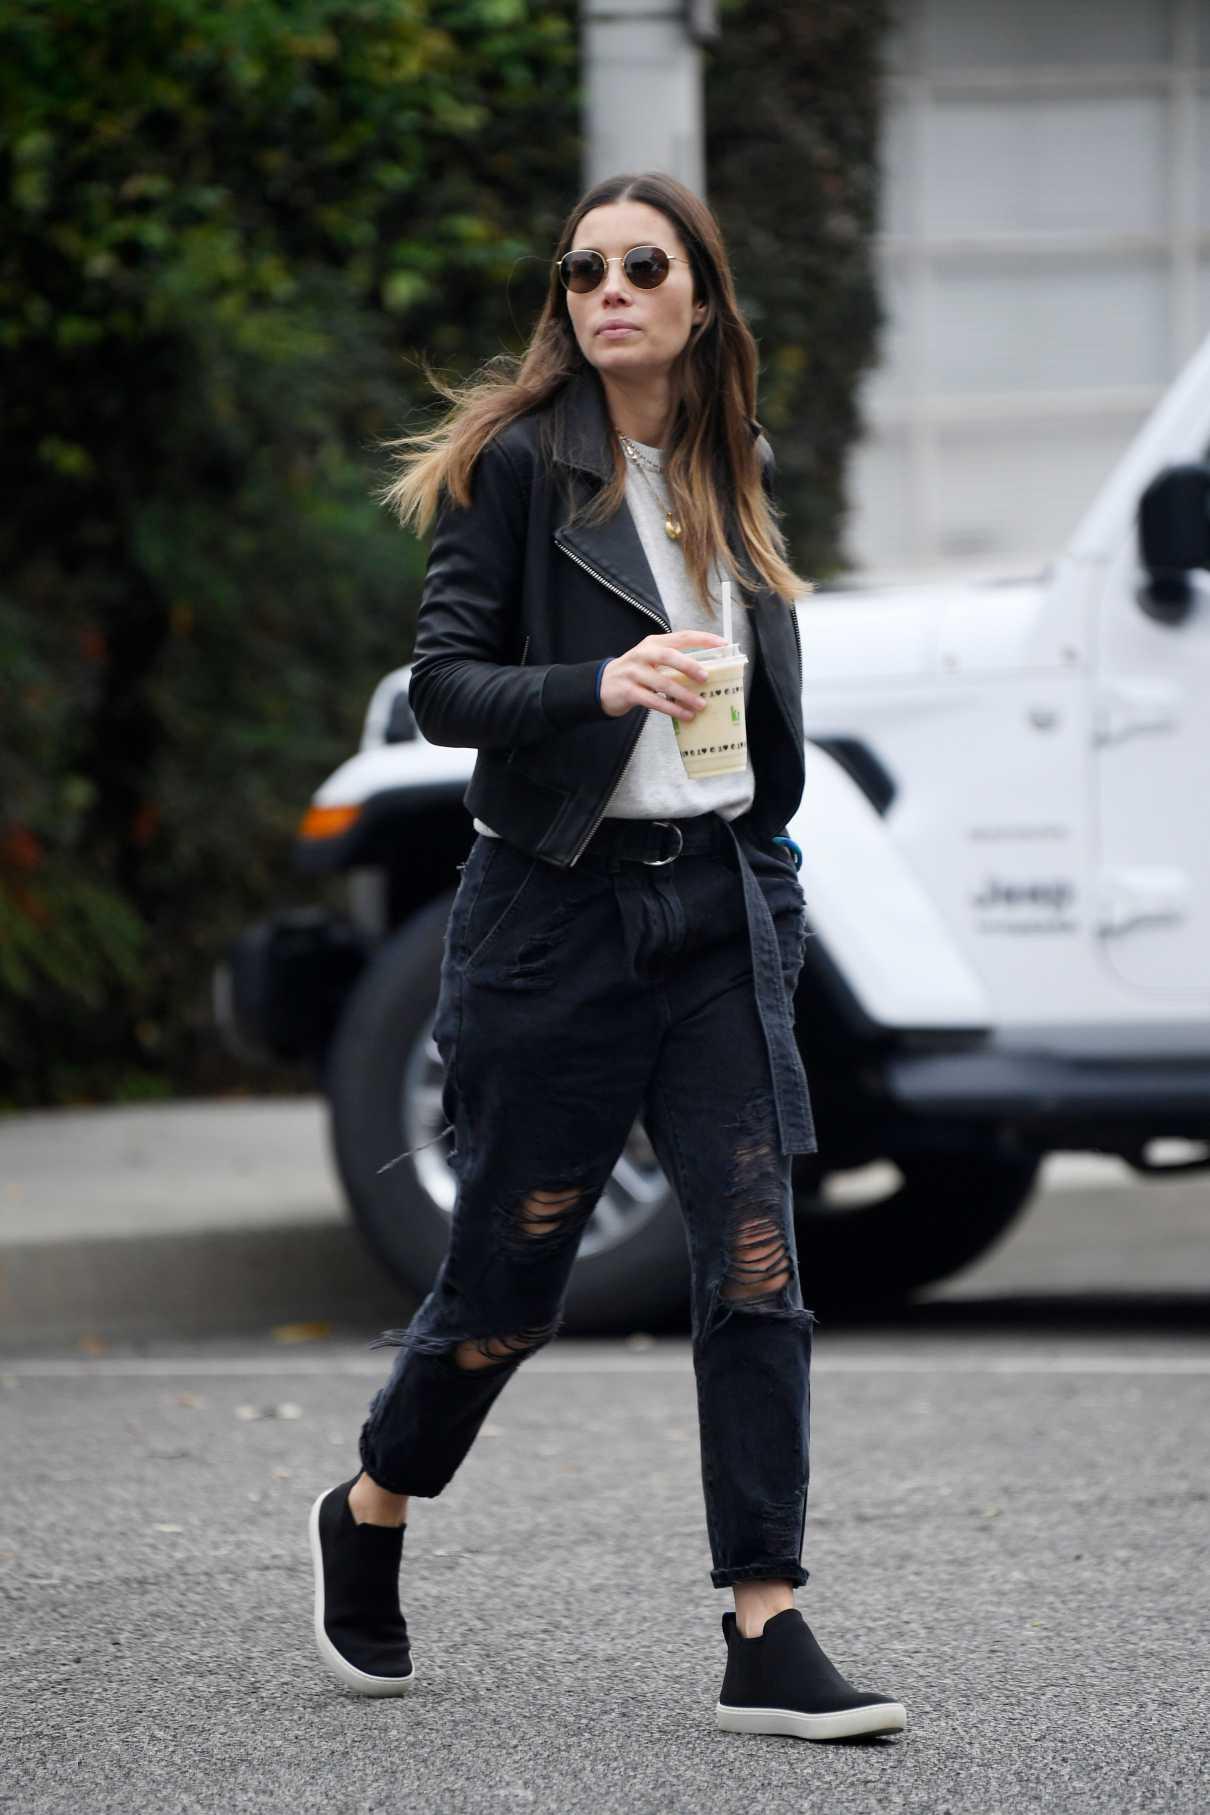 Jessica Biel in a Black Jacket